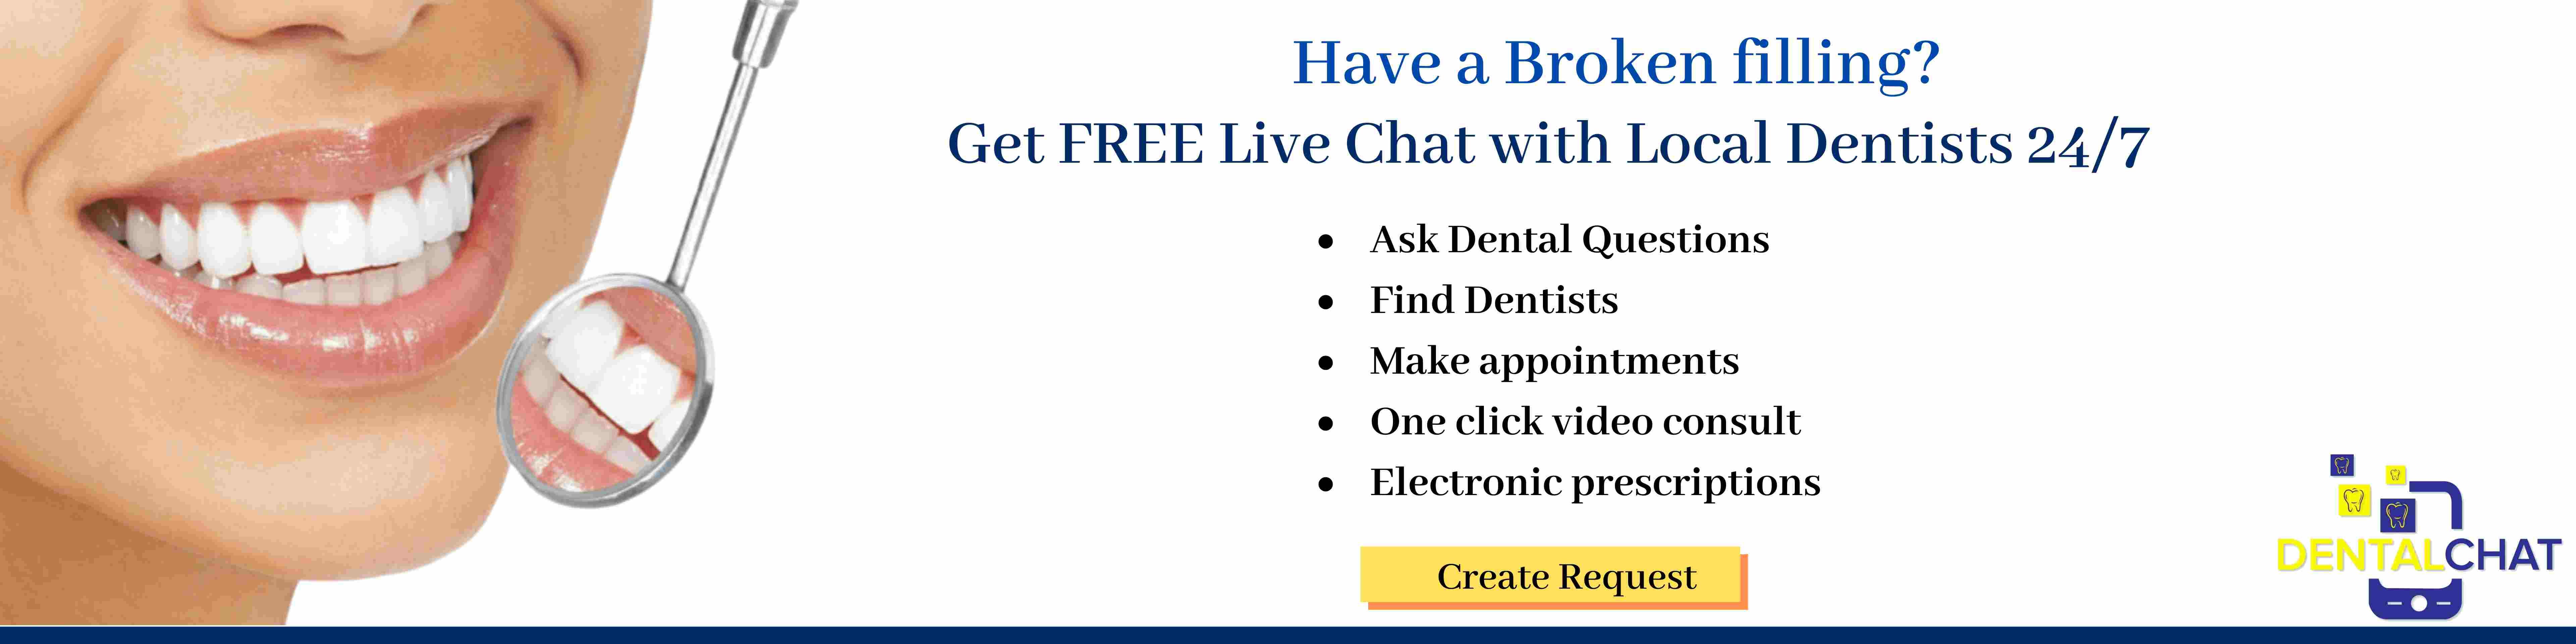 Broken composite dental filling question ask best local dentists, tooth fillings broken questions ask emergency dentist online